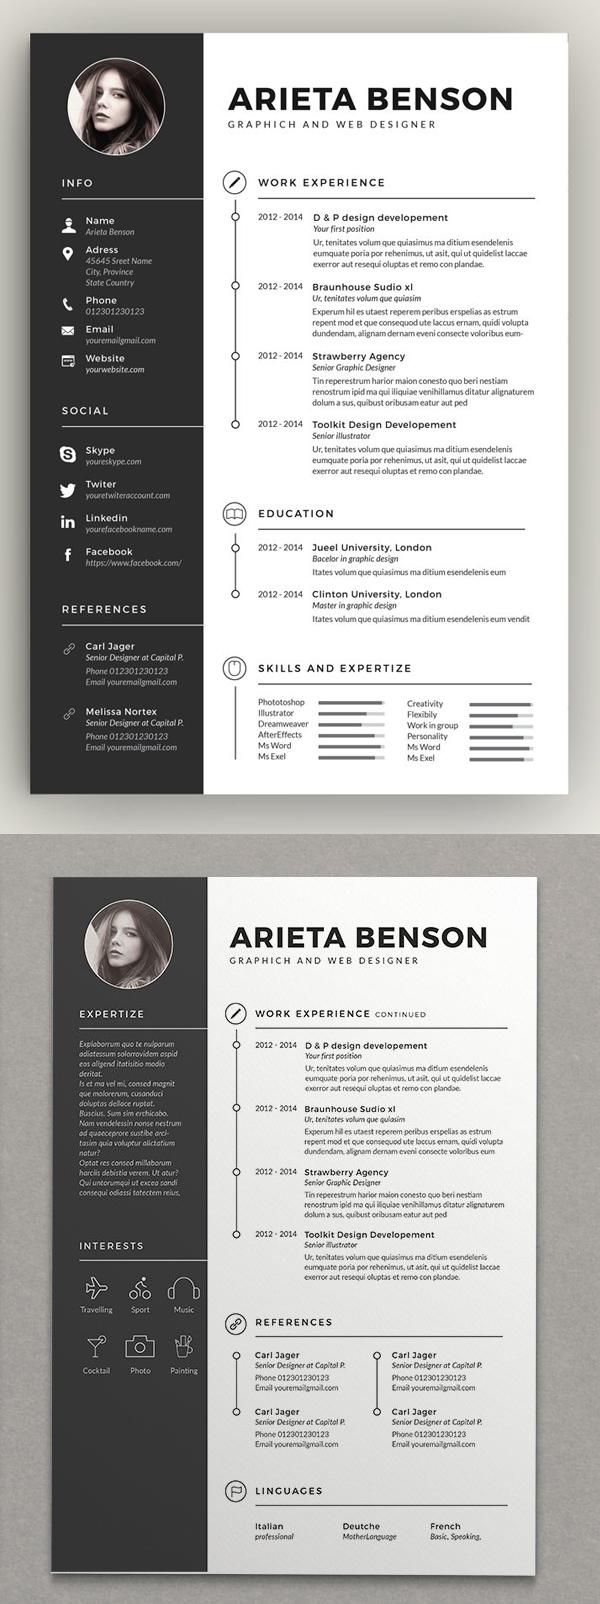 Clean Cv-Resume Design Template